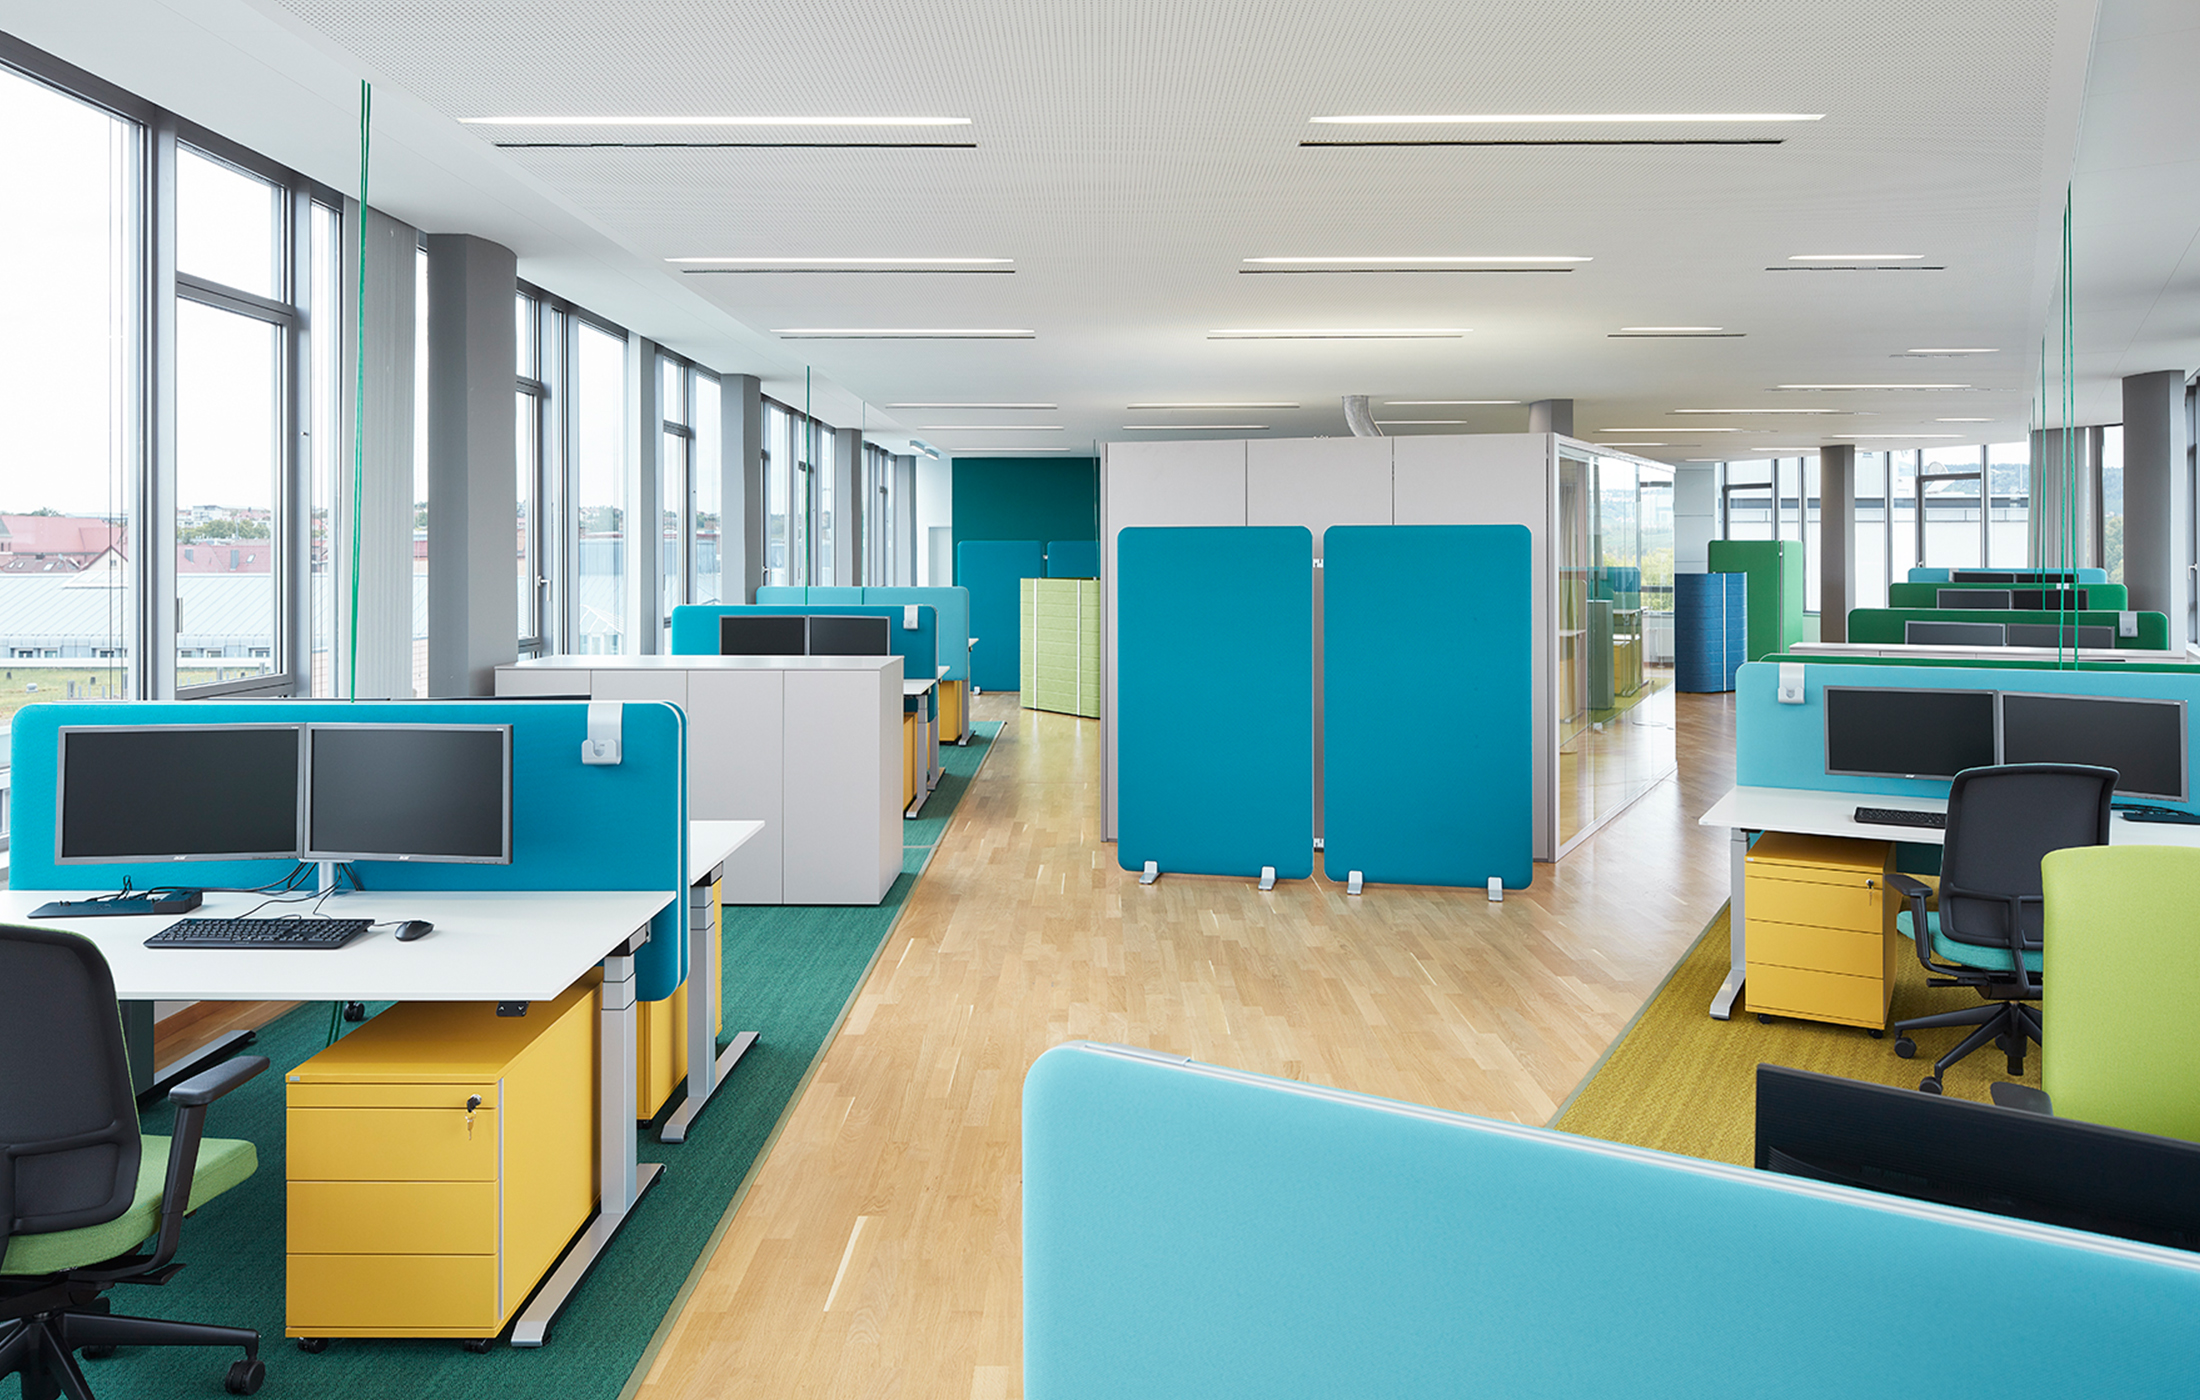 2020, Umgestaltung der PSD-Bank, Stuttgart